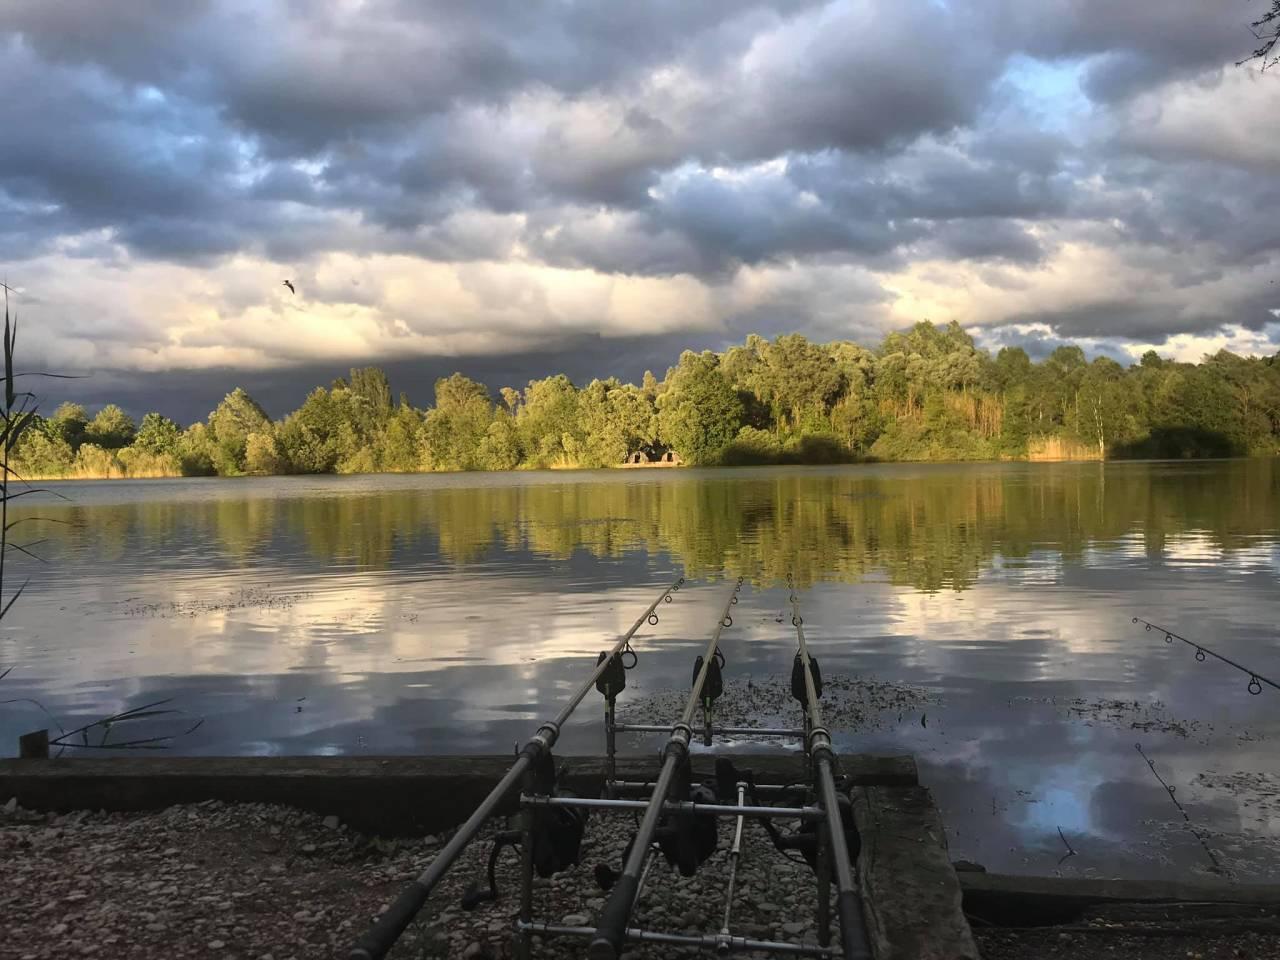 etang de bows carp fishery france